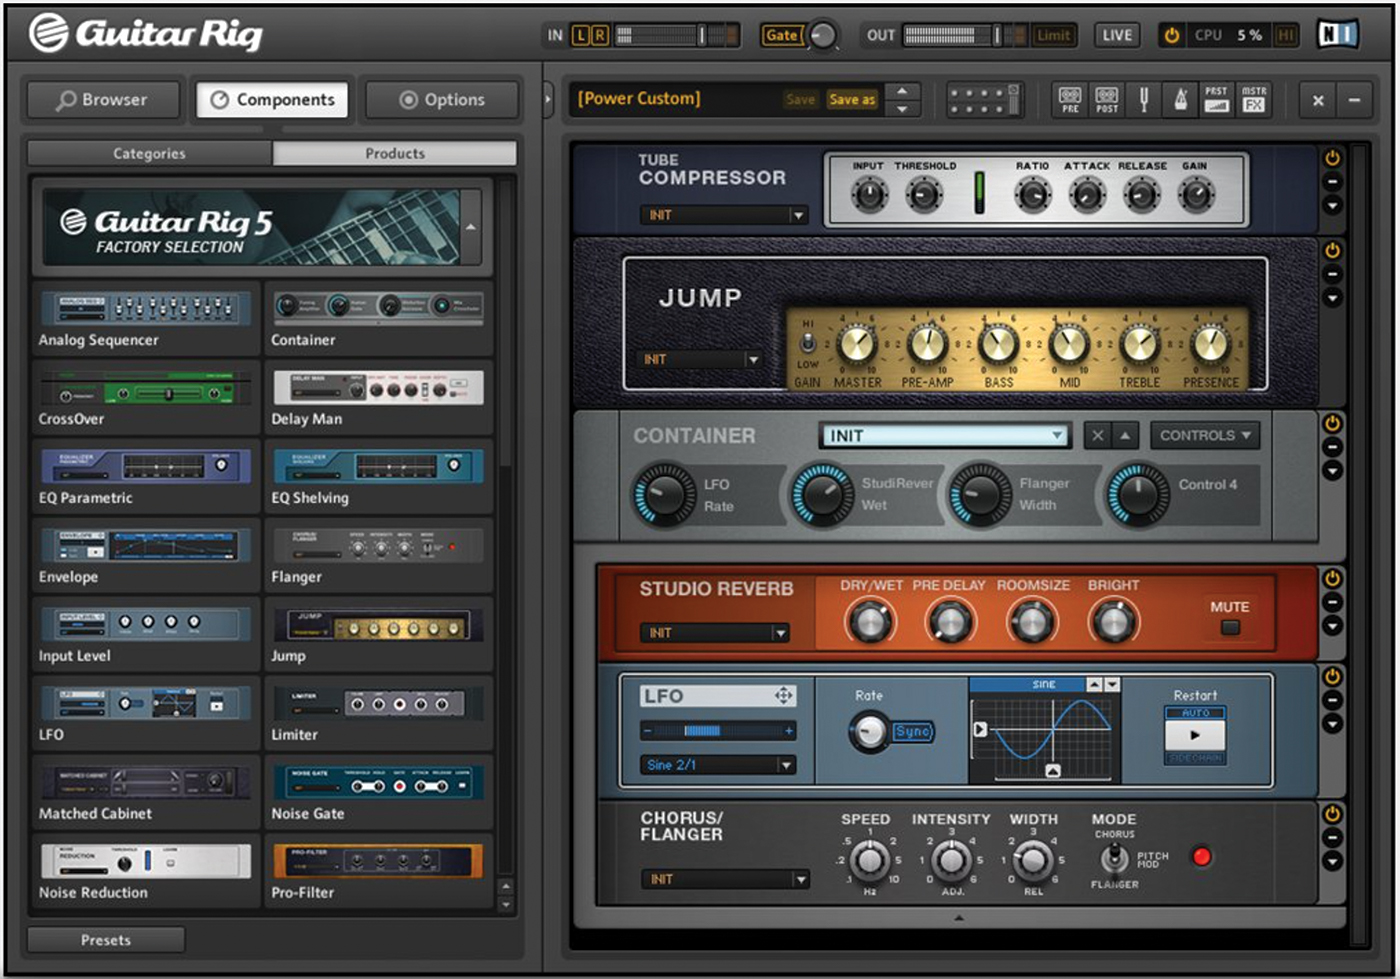 Guitar Rig Player 5